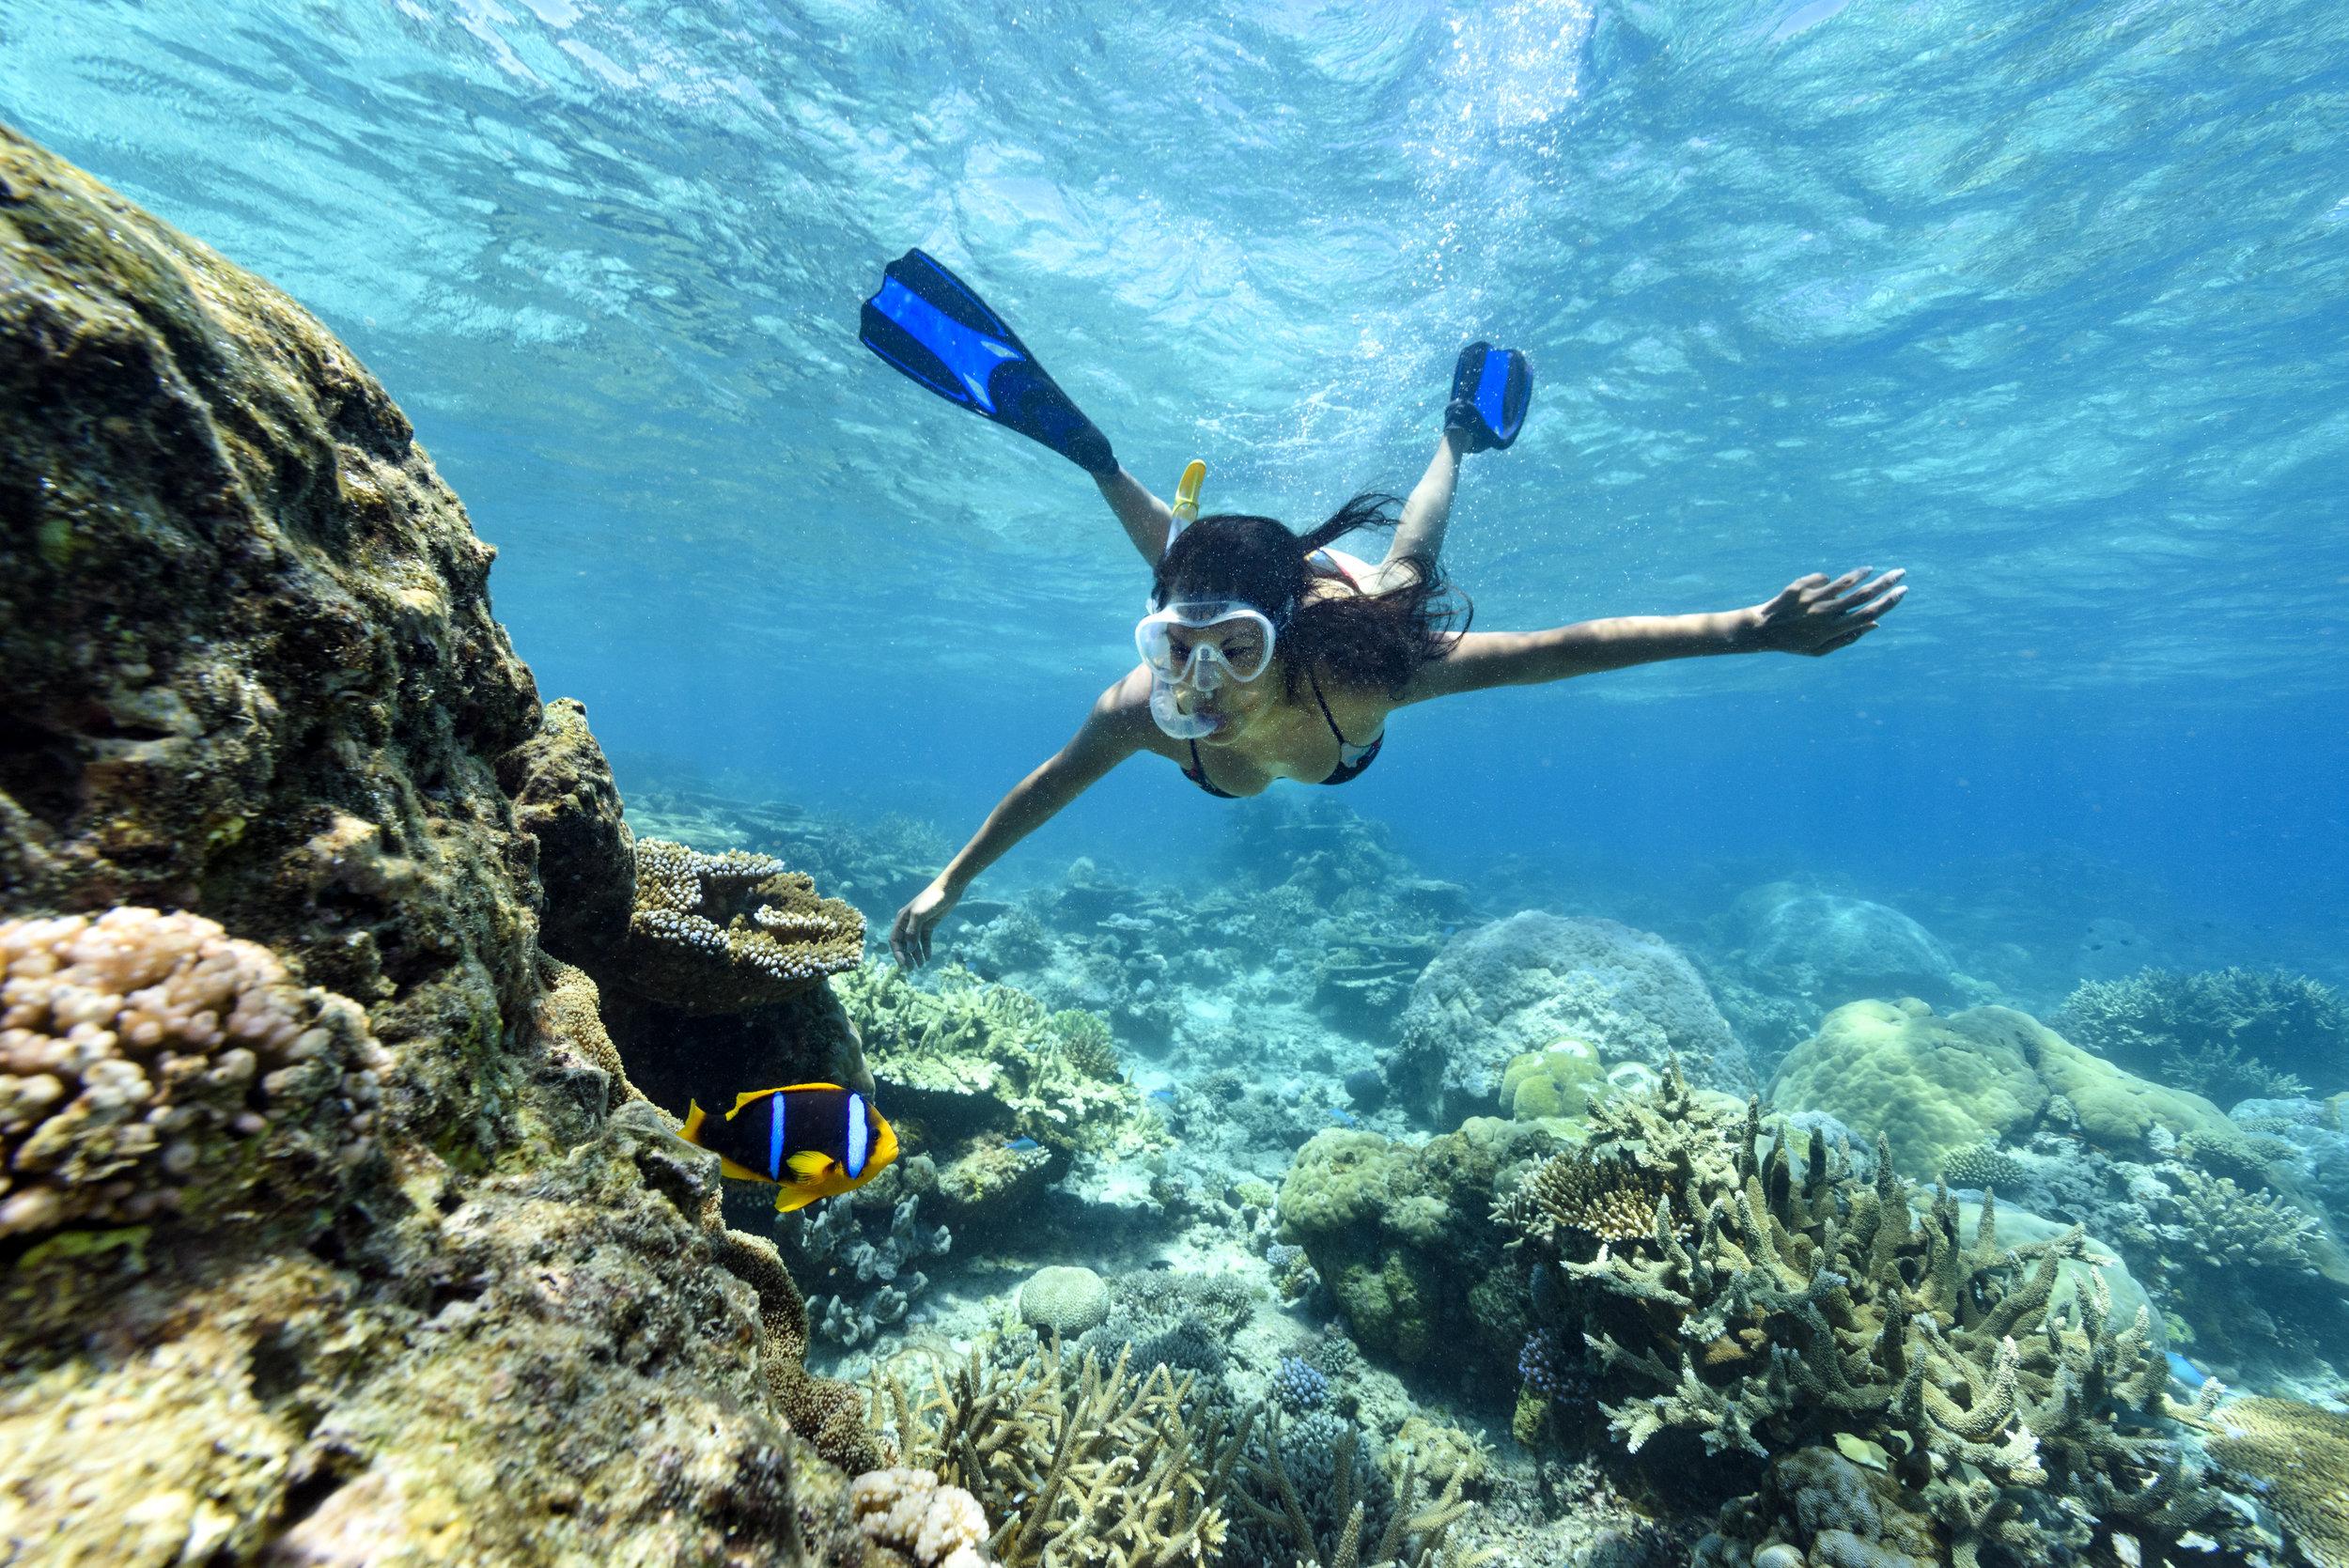 Fiji Best Resort Snorkeling - Rainbow Reef1.jpg